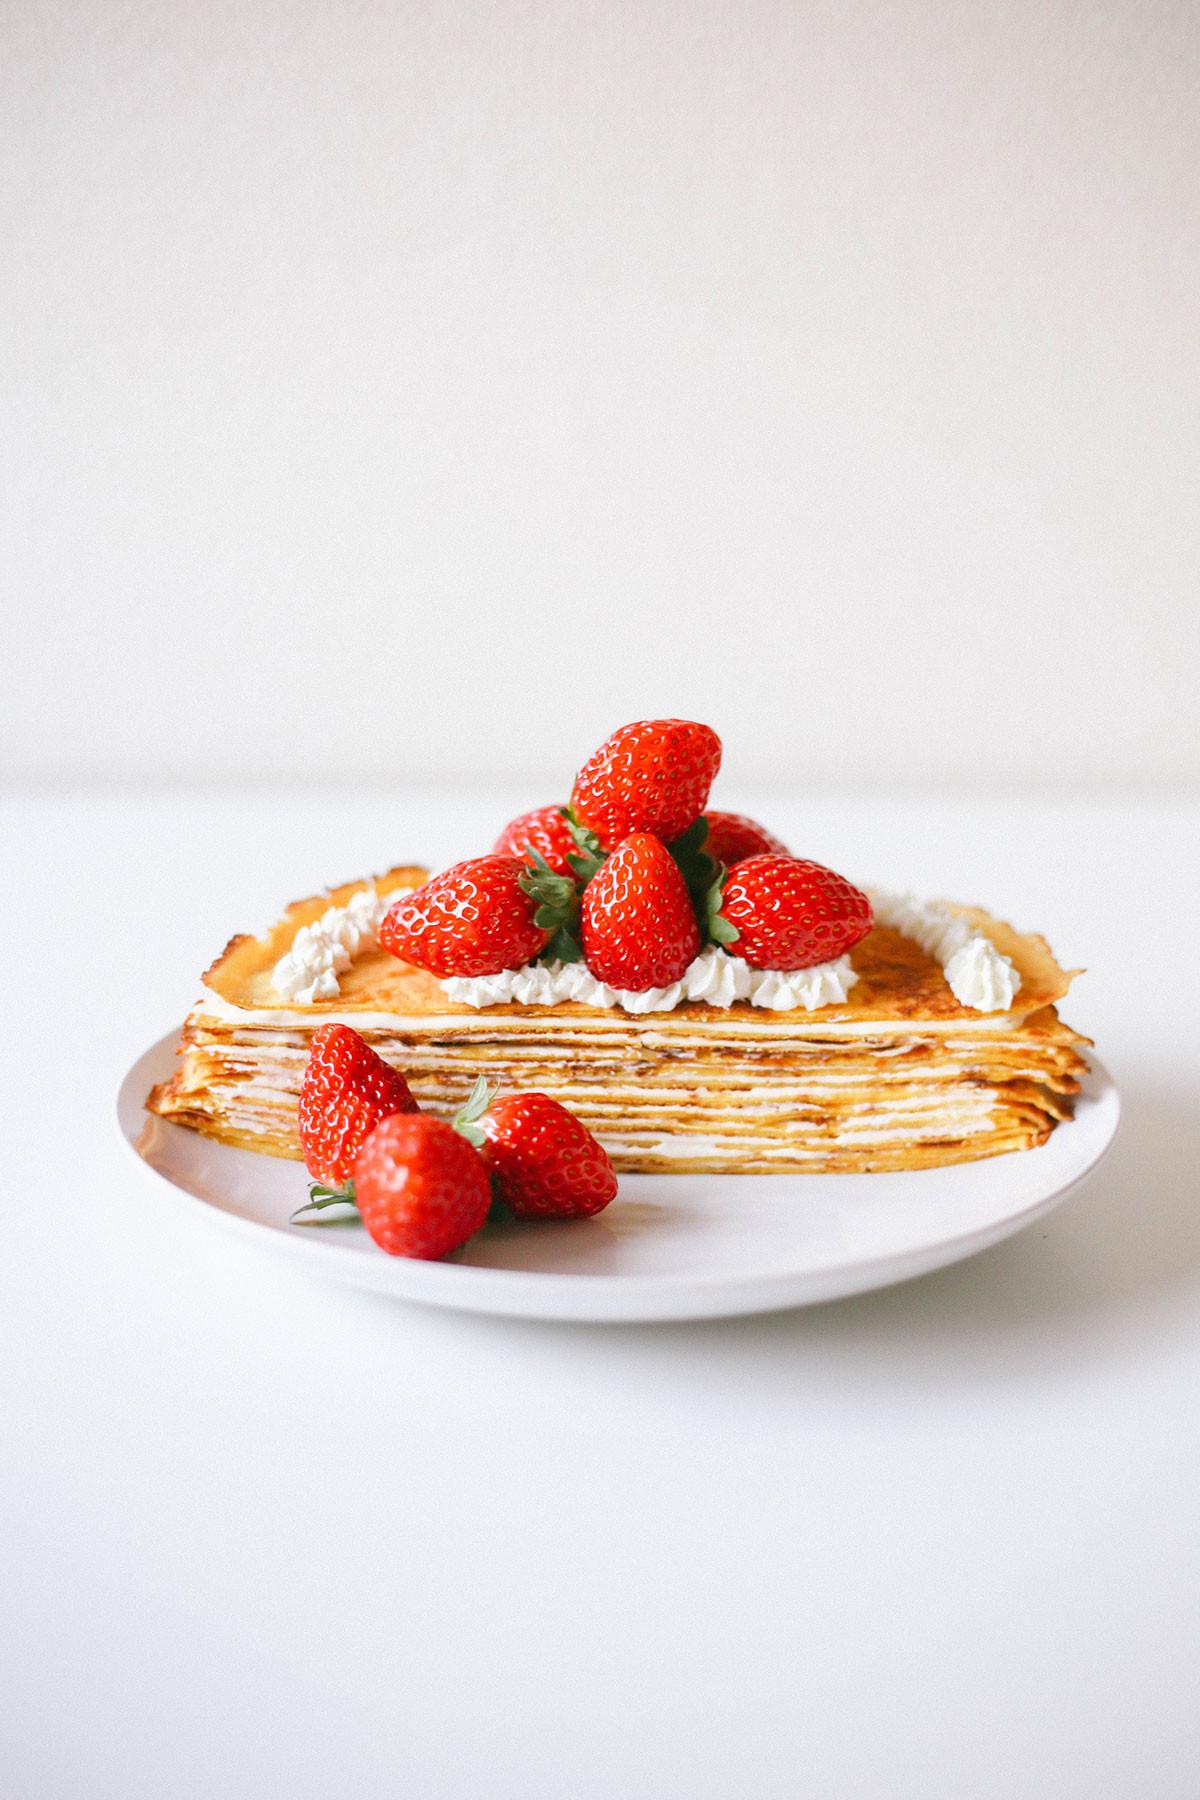 Keto Strawberry Cake  Keto Crepe Cake with Strawberries Mille Crêpe Happy Keto